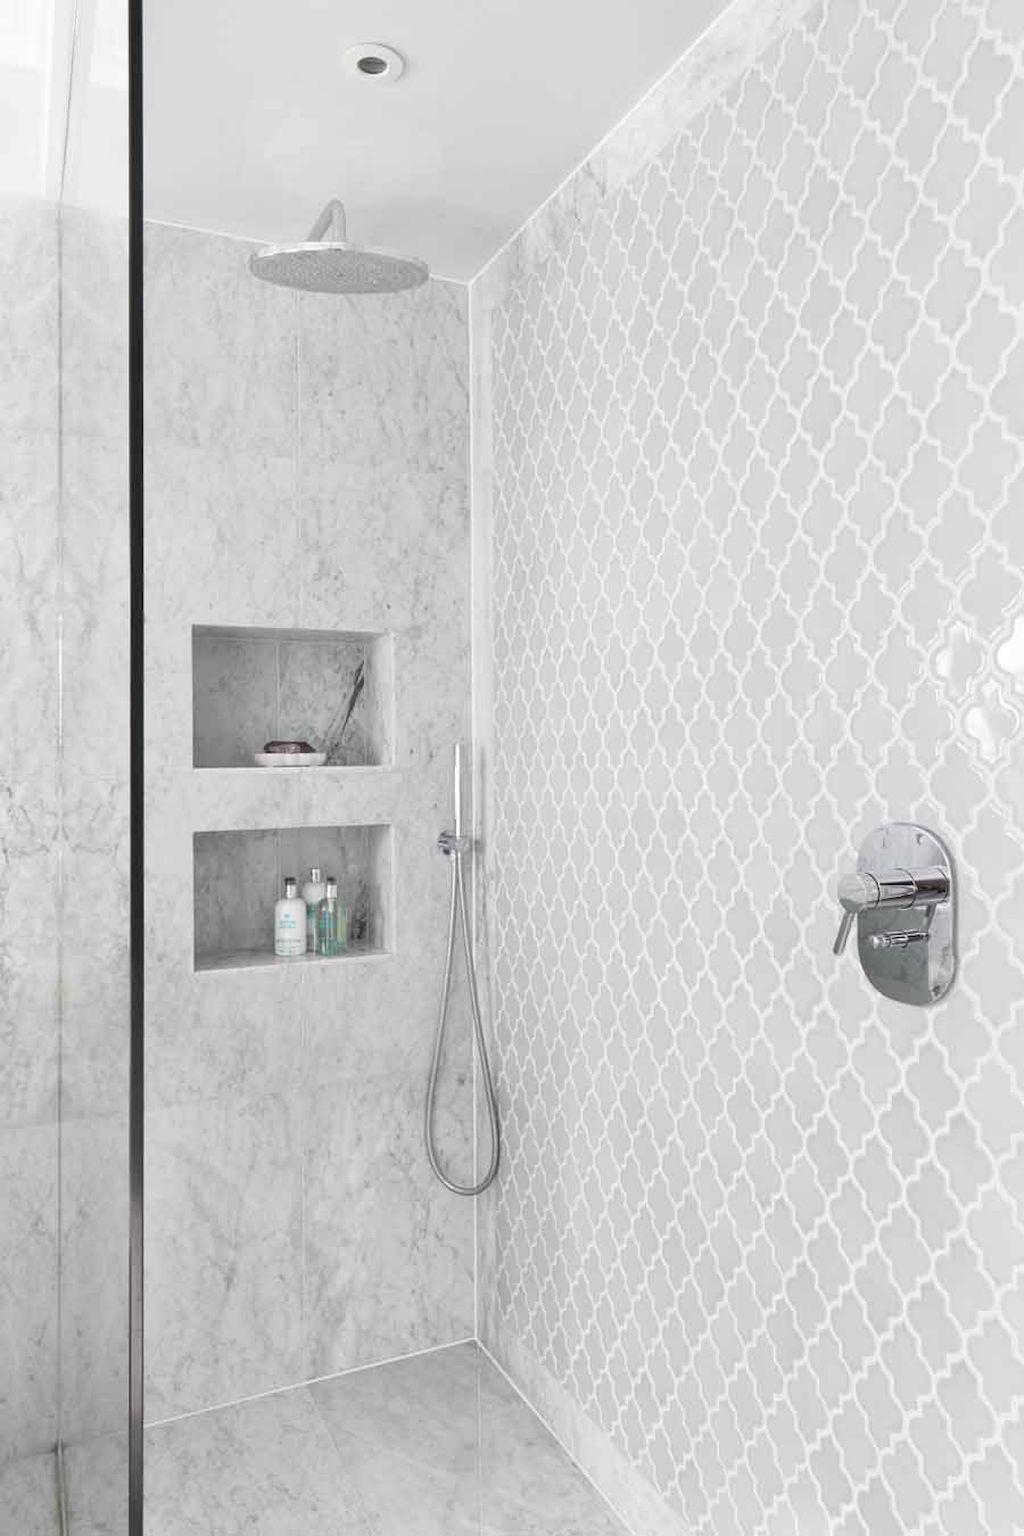 Best Inspire Bathroom Tile Pattern Ideas (49 | Tile patterns ...